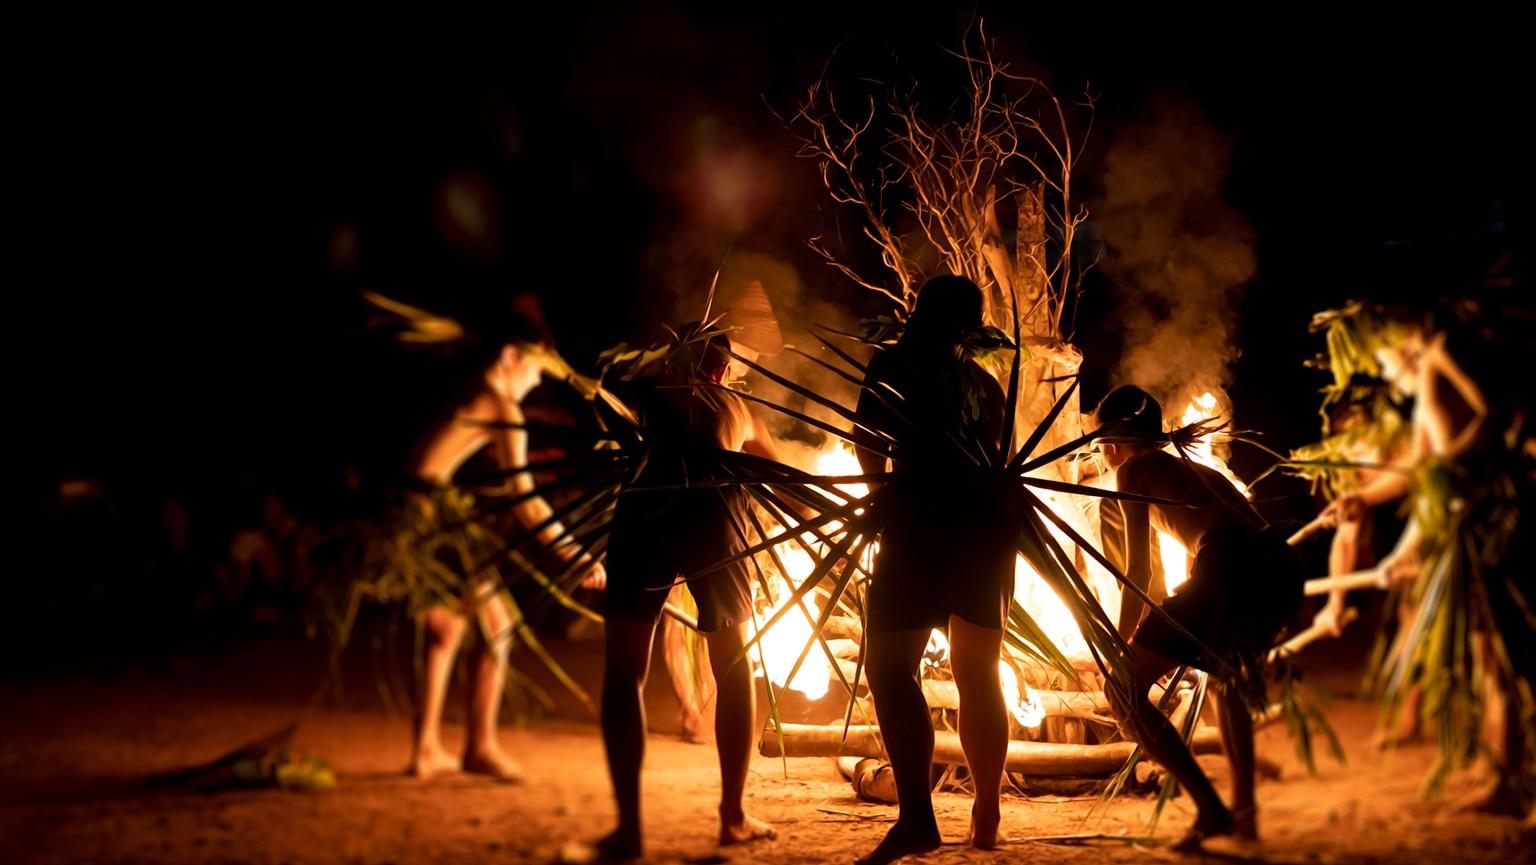 South Africa—The Zulu Kingdom